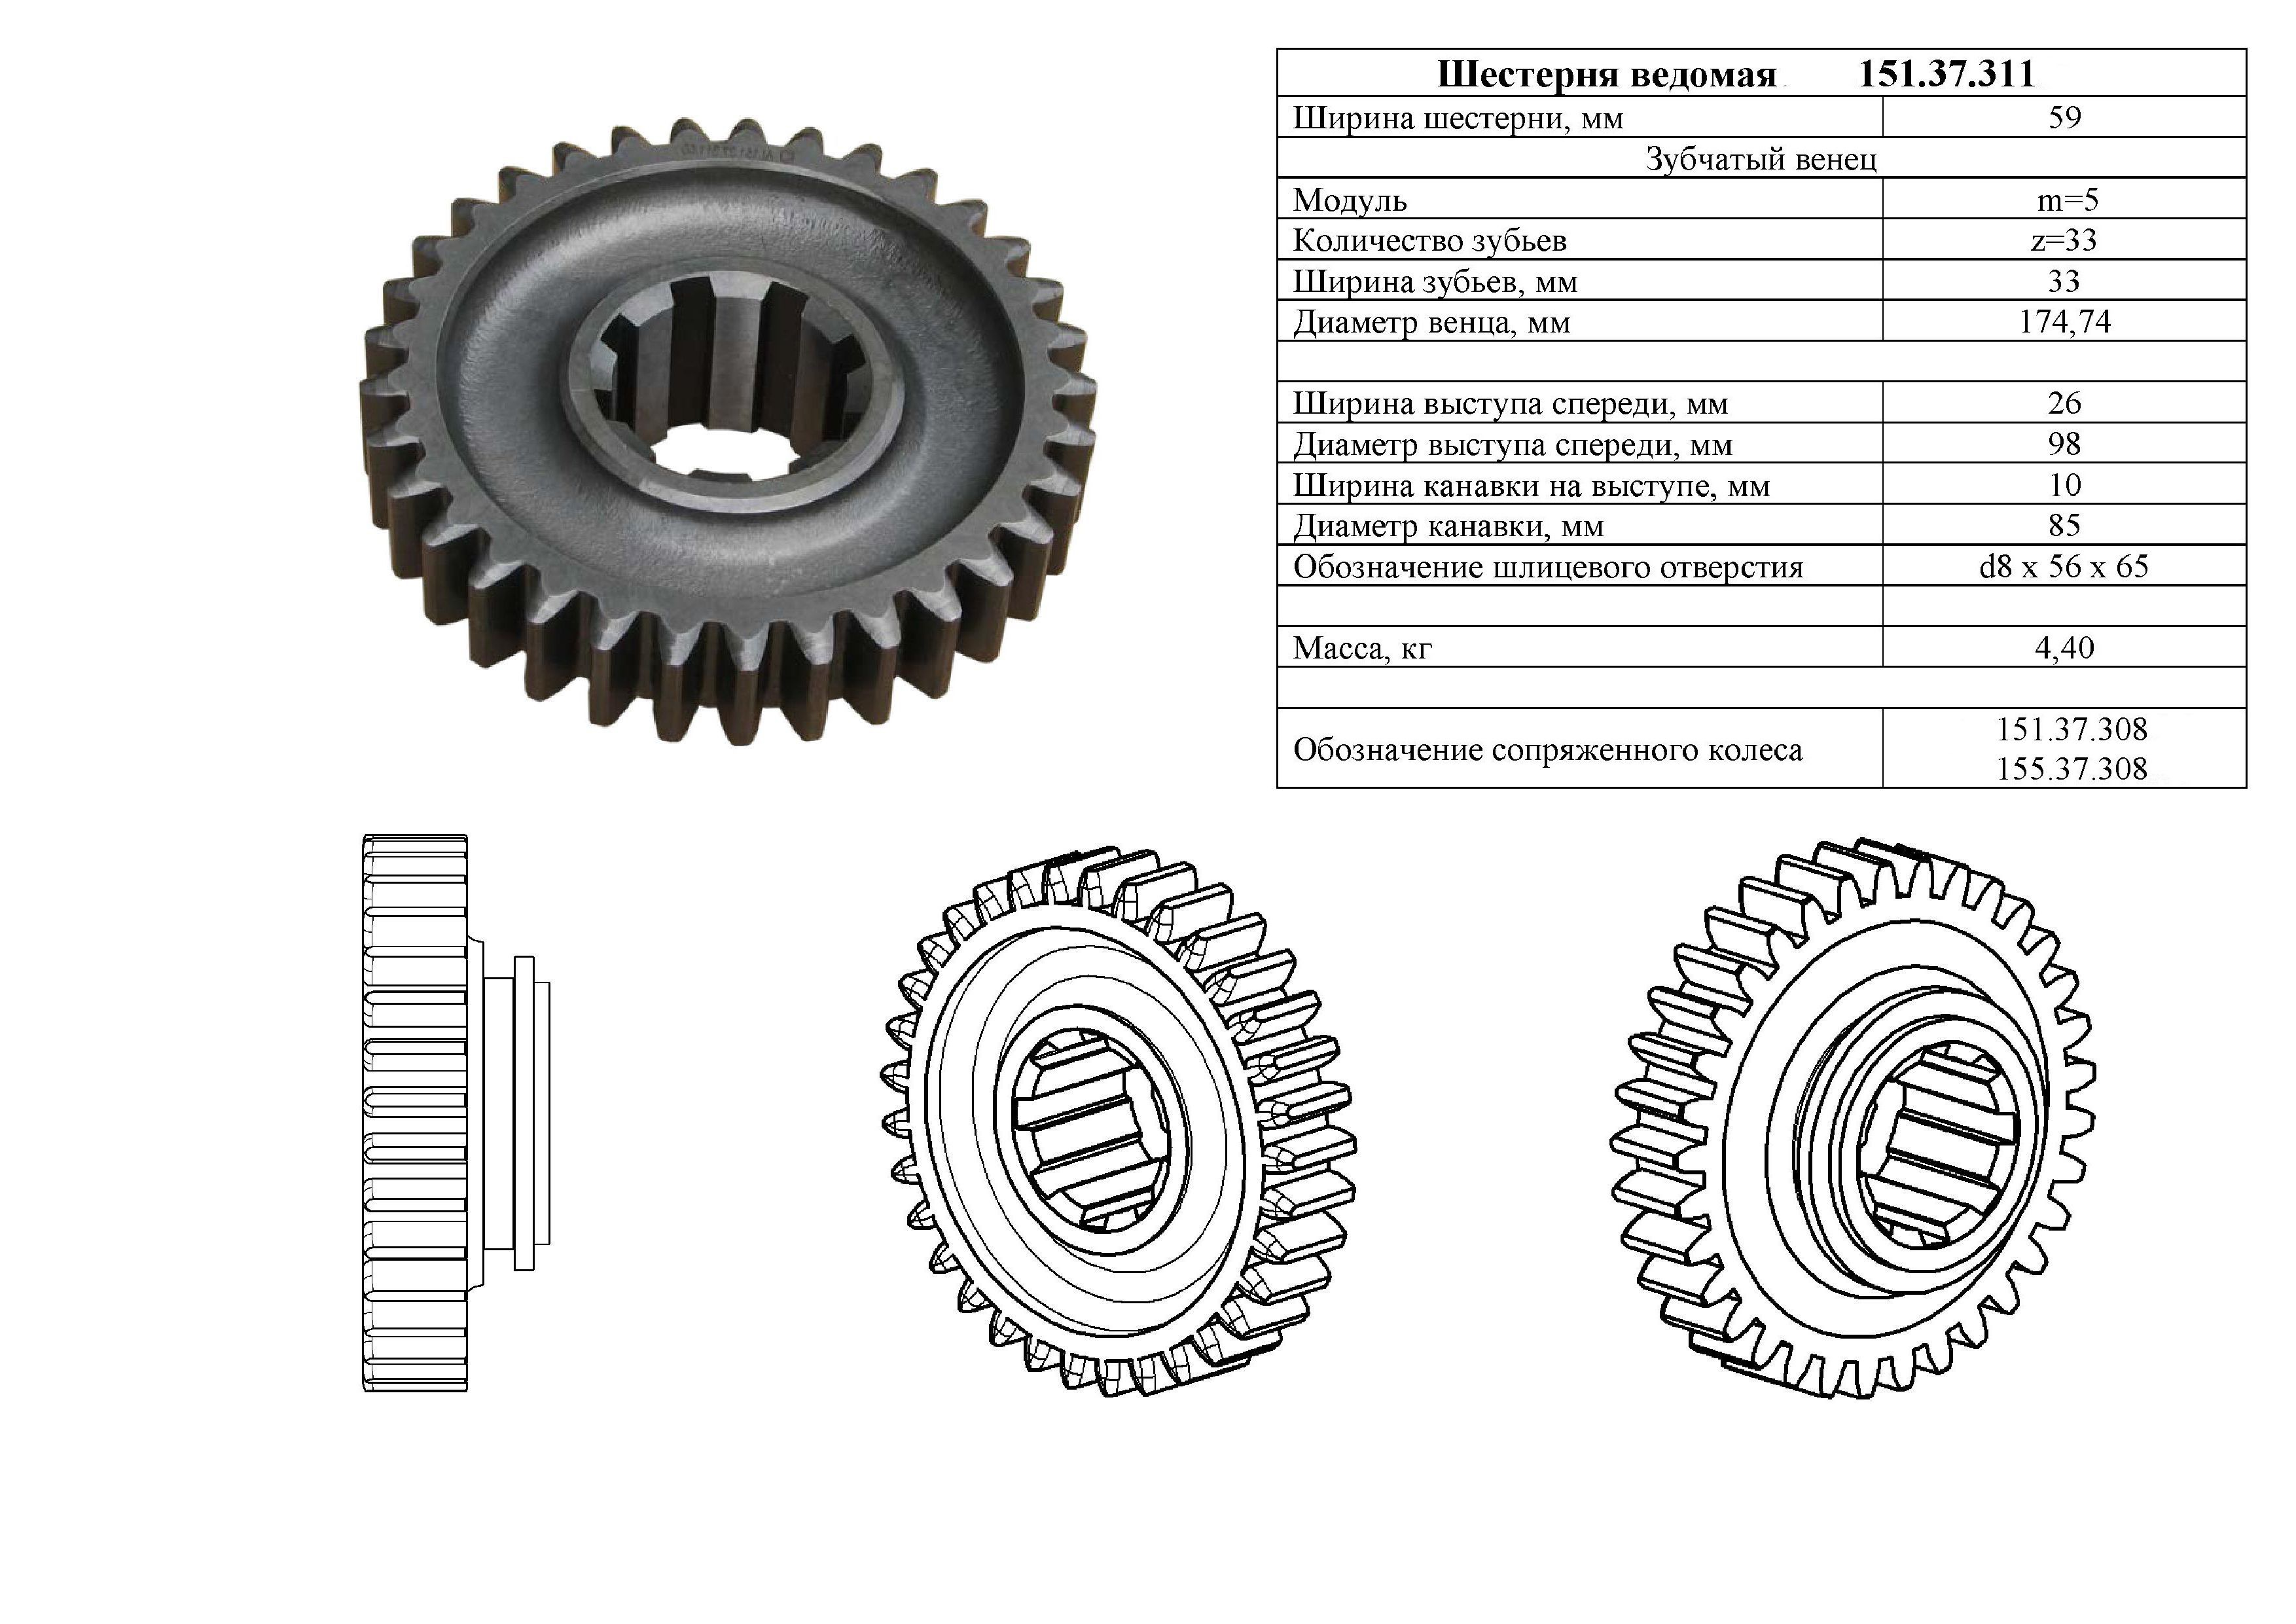 Характеристики Шестерни 151.37.311-2Б